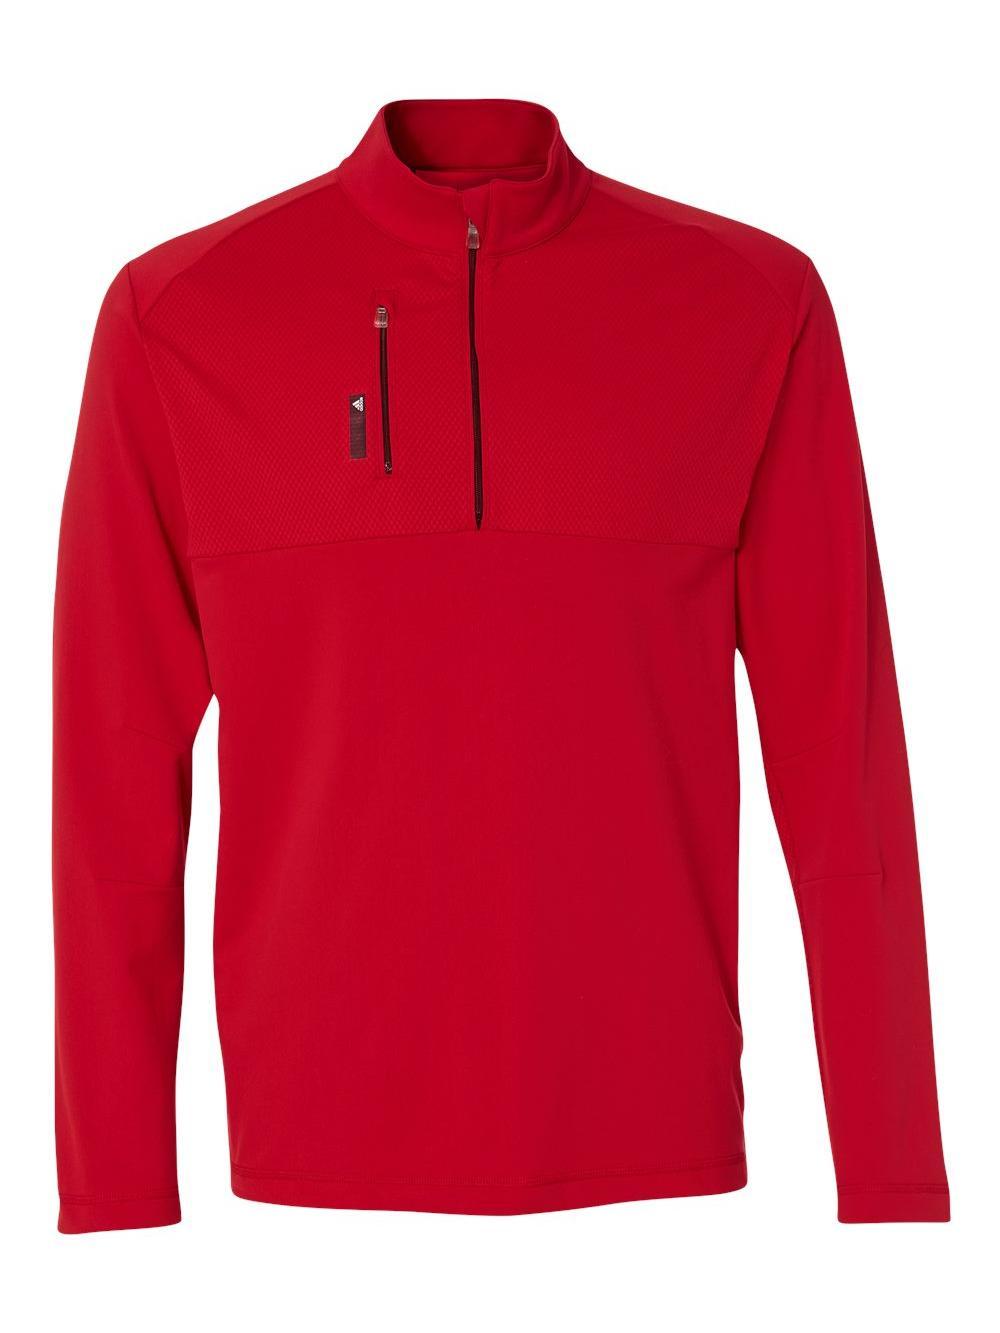 adidas Golf Men's puremotion™ Mixed Media Quarter-Zip